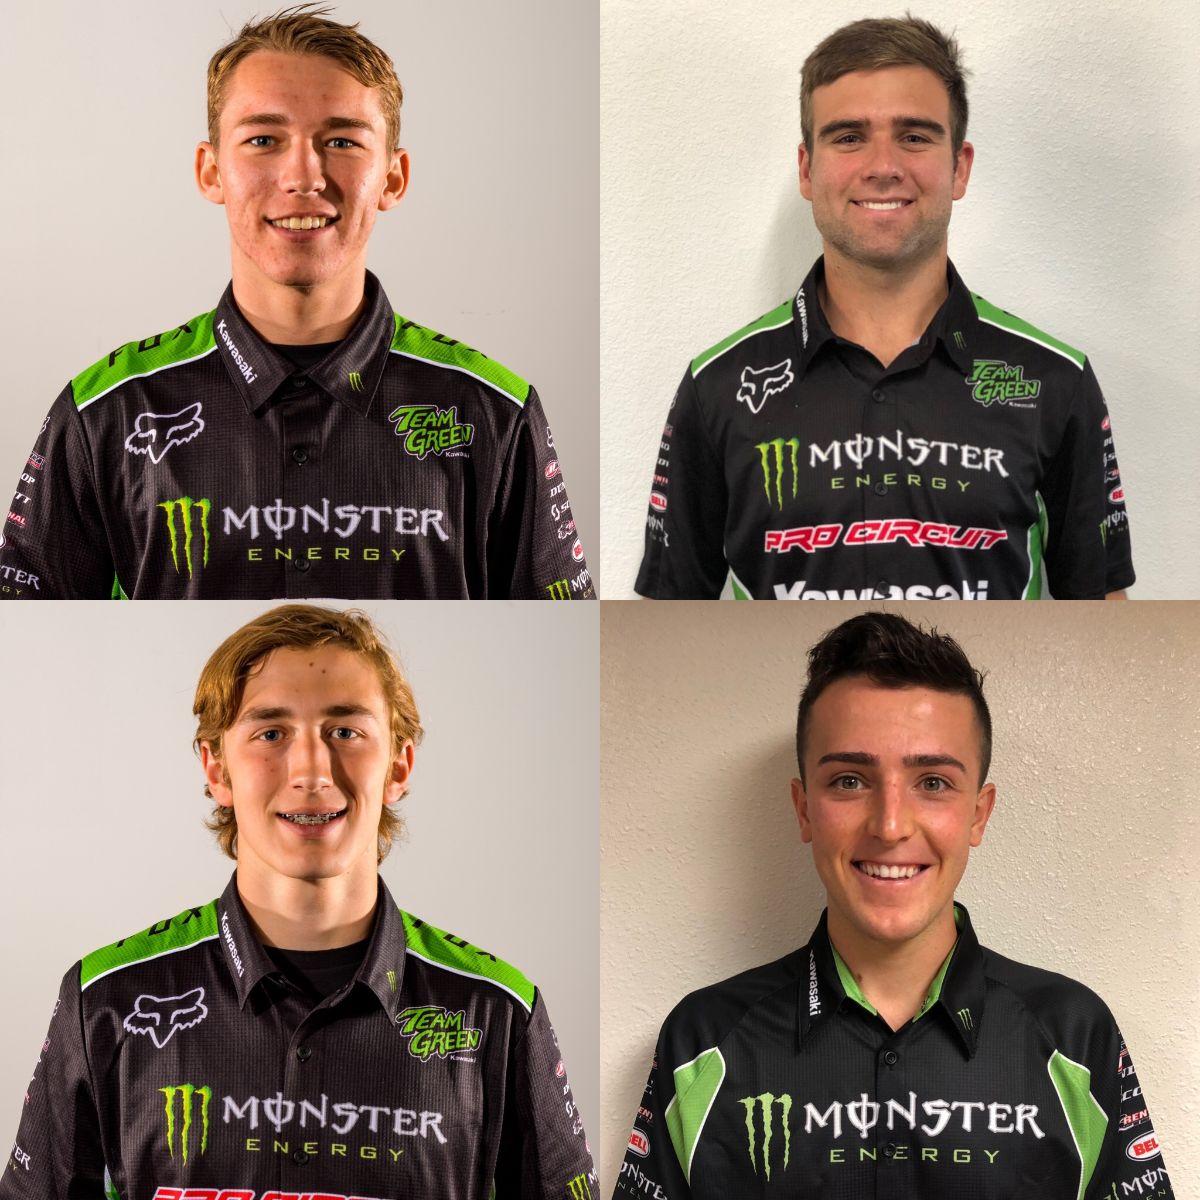 Monster / Pro Circuit / Kawasaki Announces 2020 Riders